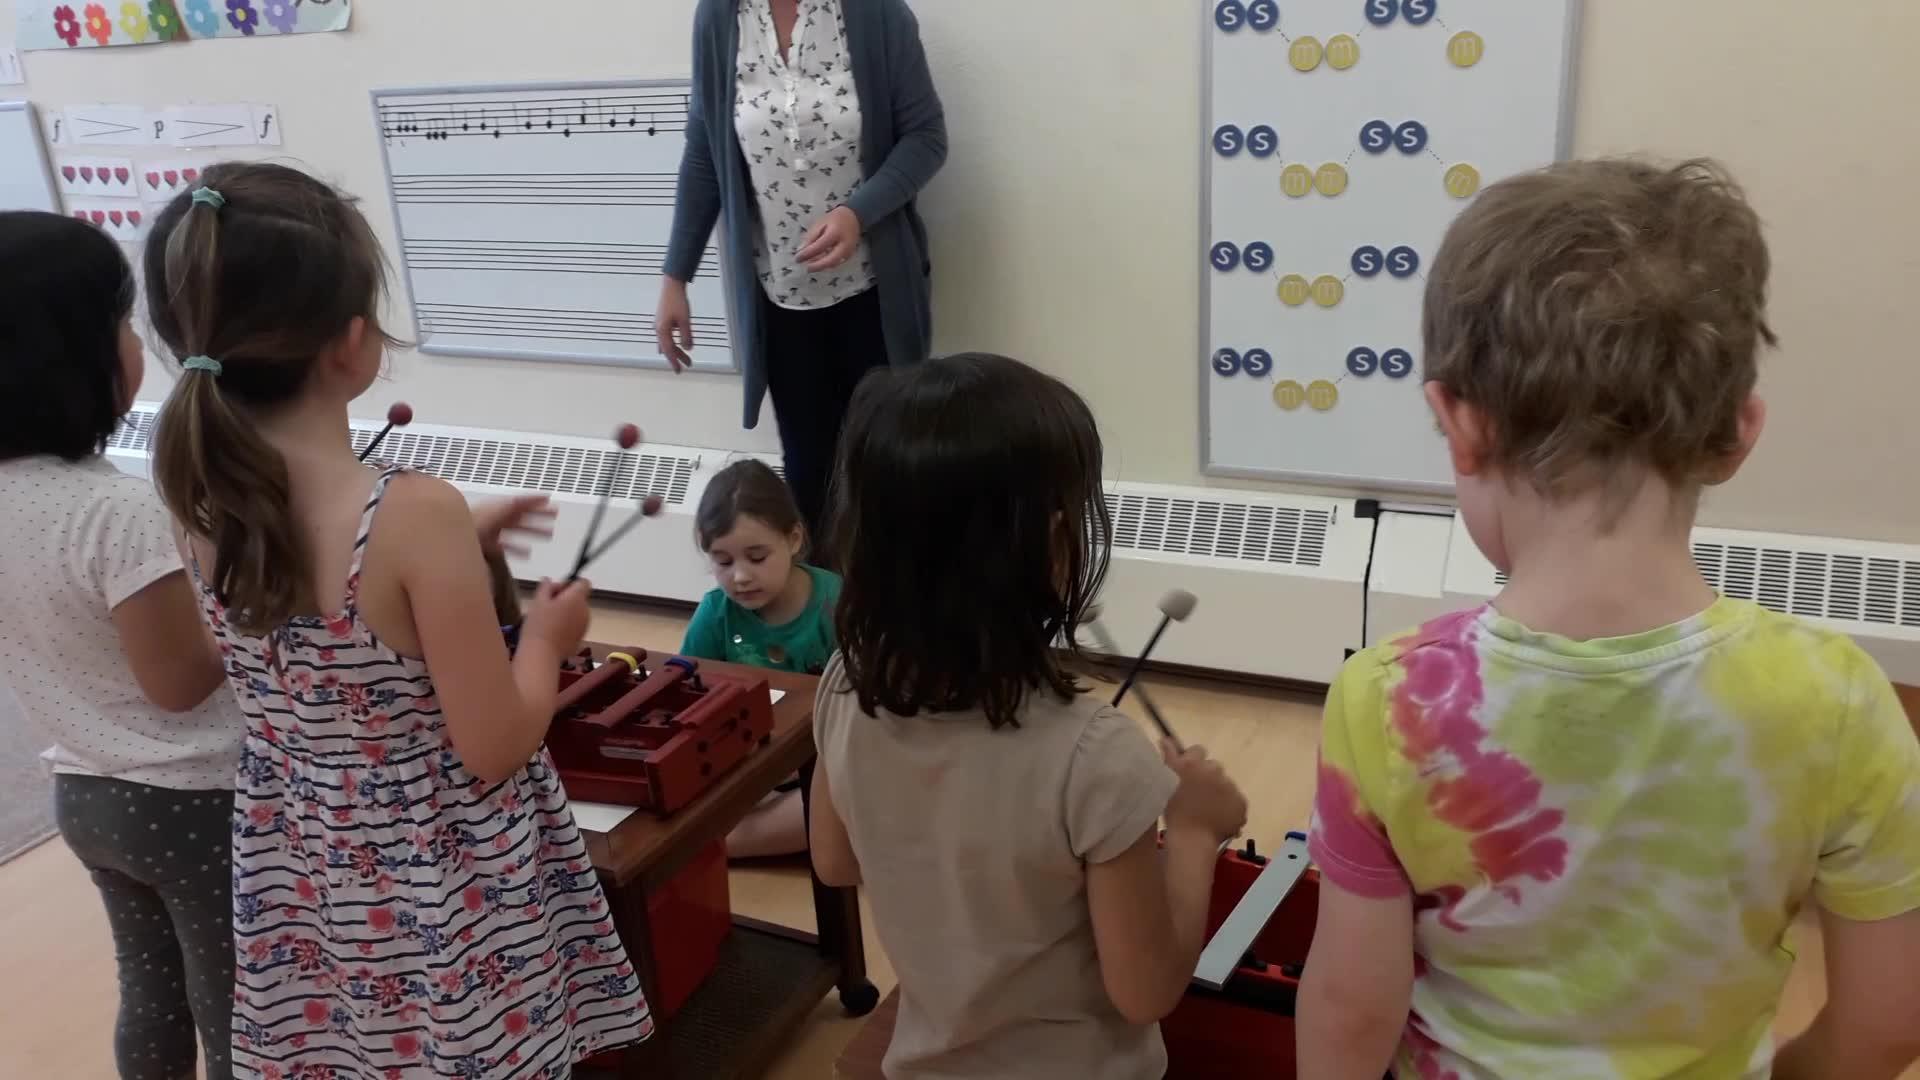 Music Reading on Xylophones (Cobbler Cobbler)